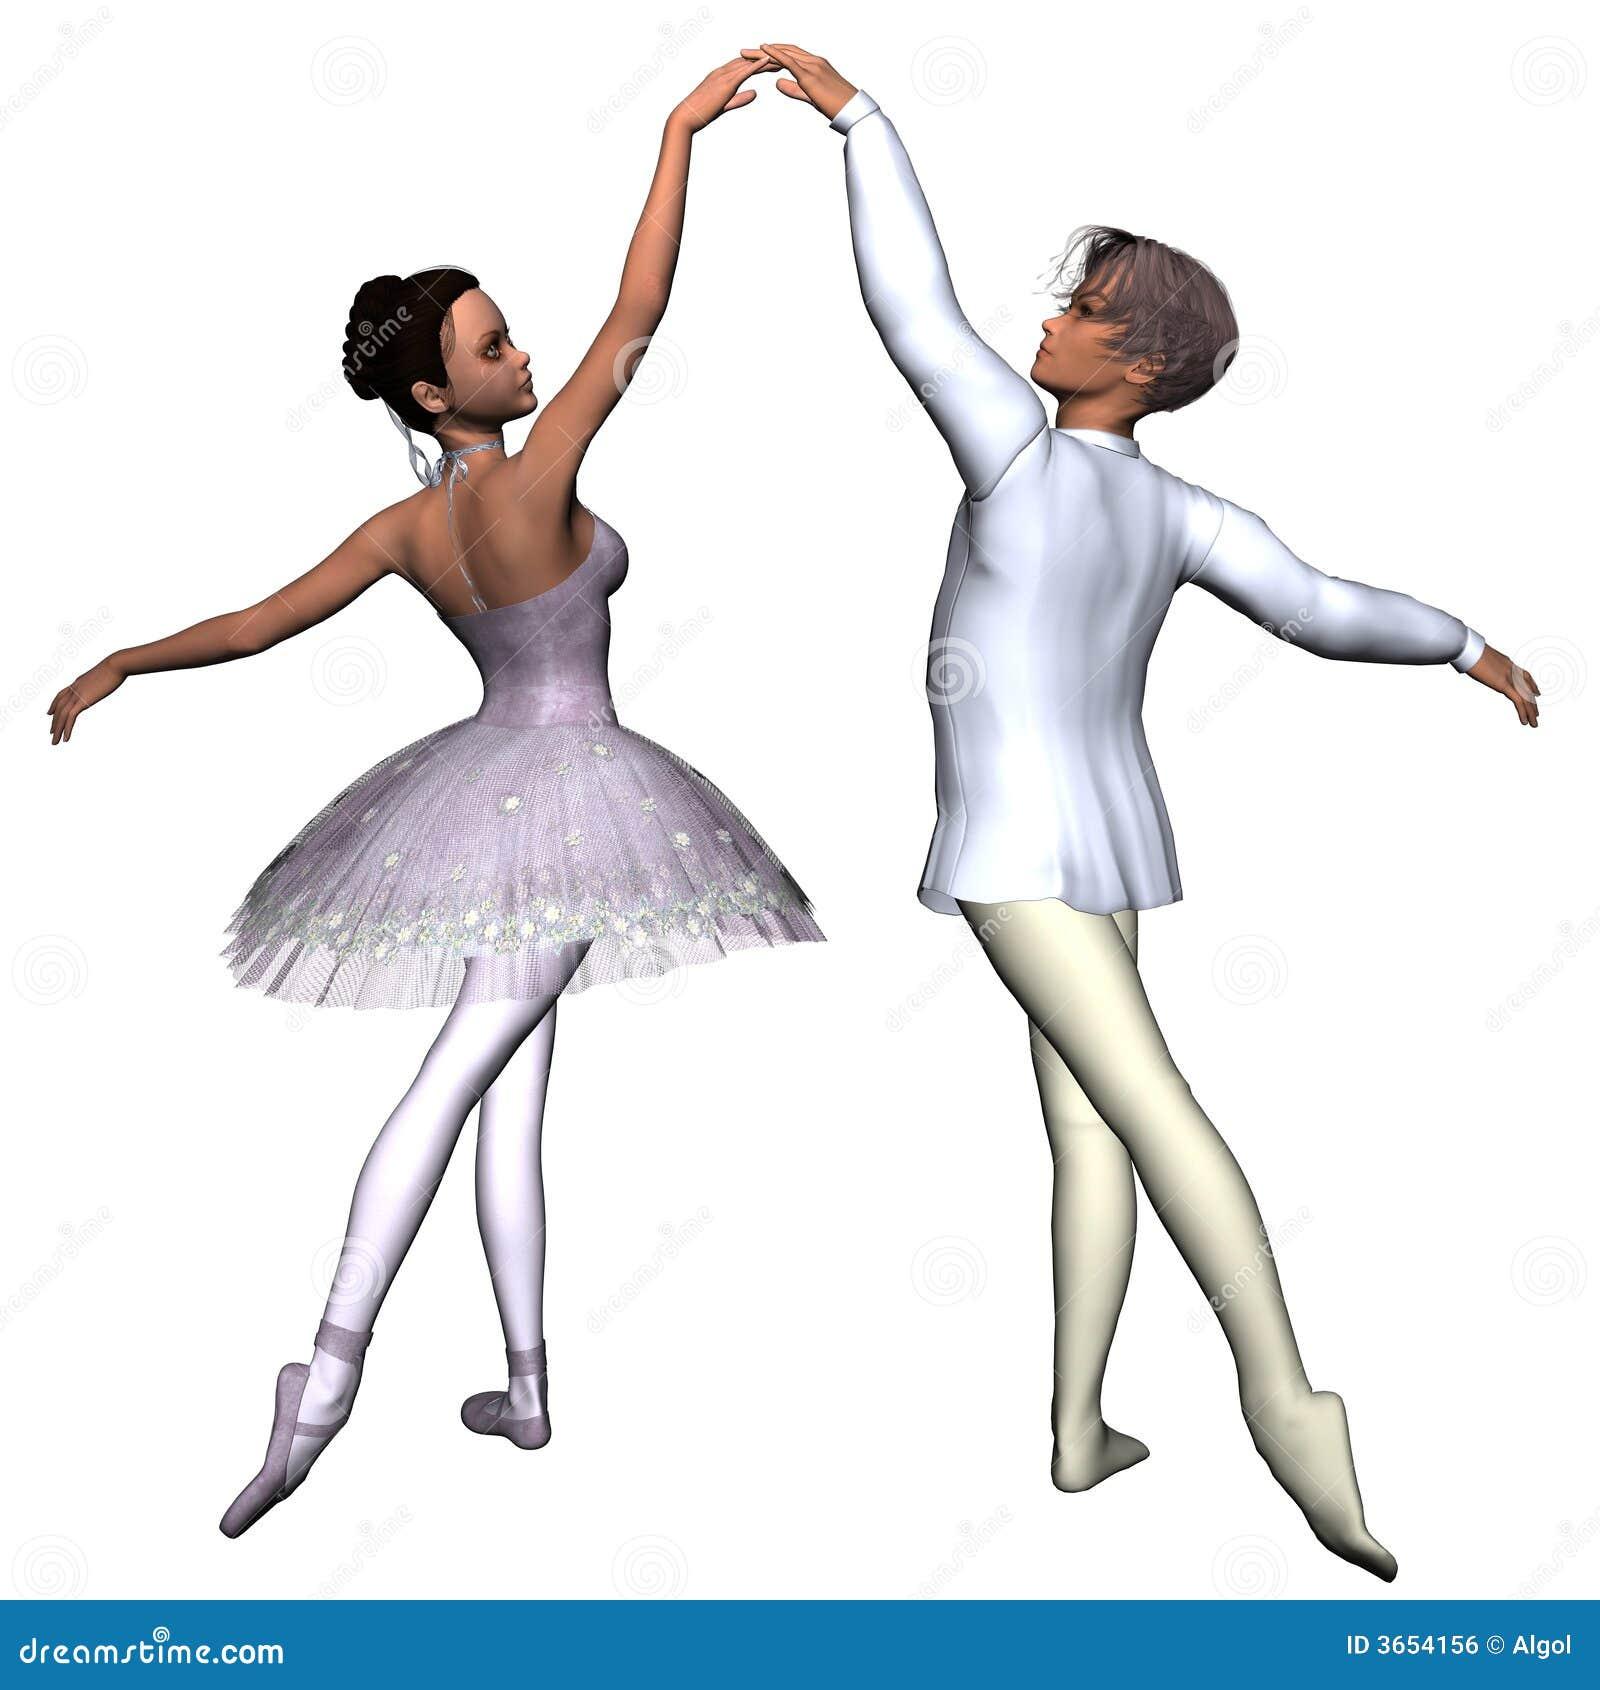 ballet pas de deux 1 royalty free stock image image 3654156. Black Bedroom Furniture Sets. Home Design Ideas